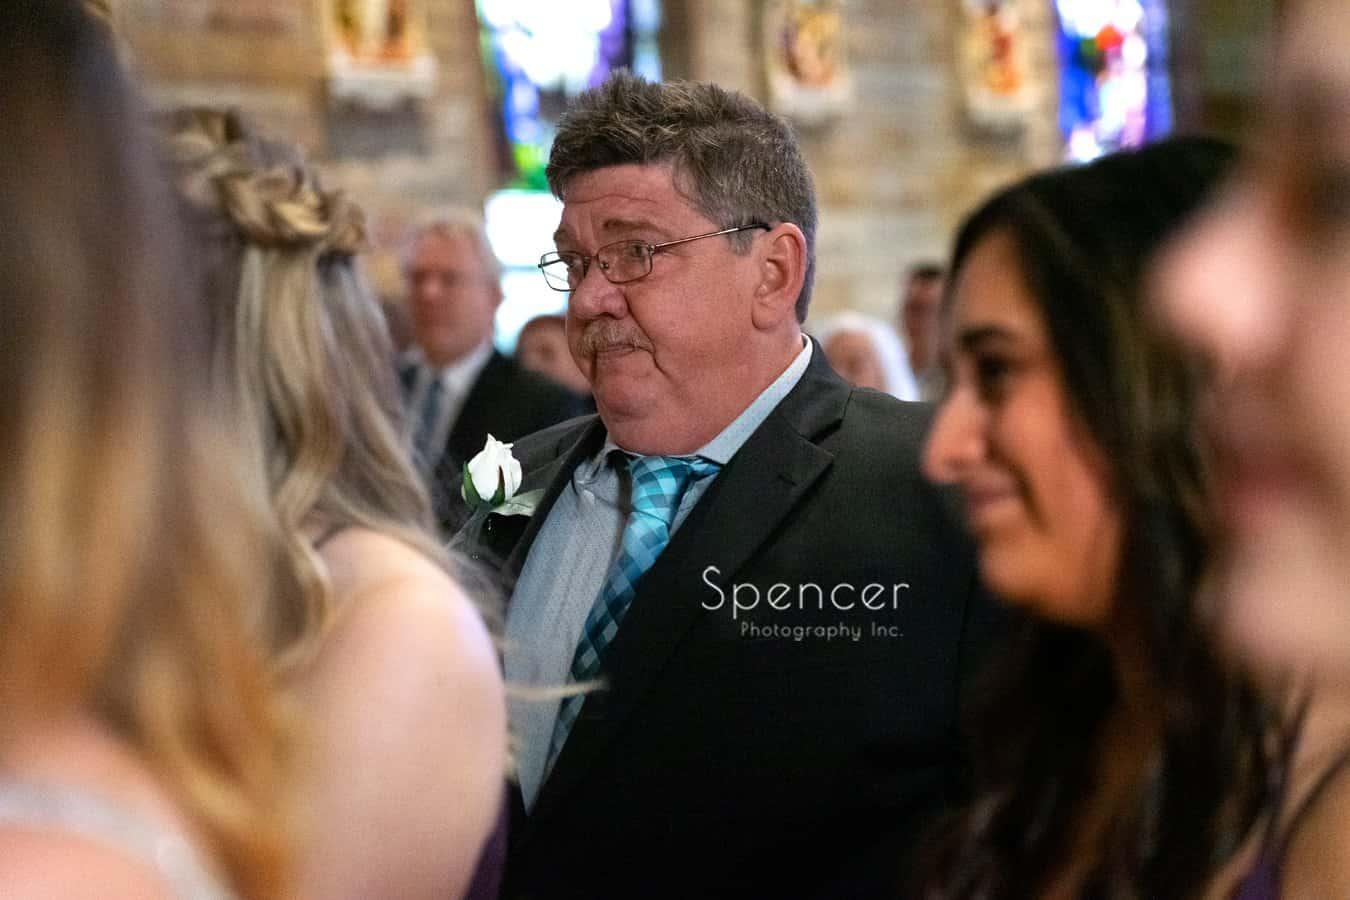 emotional dad at Indiana wedding ceremony